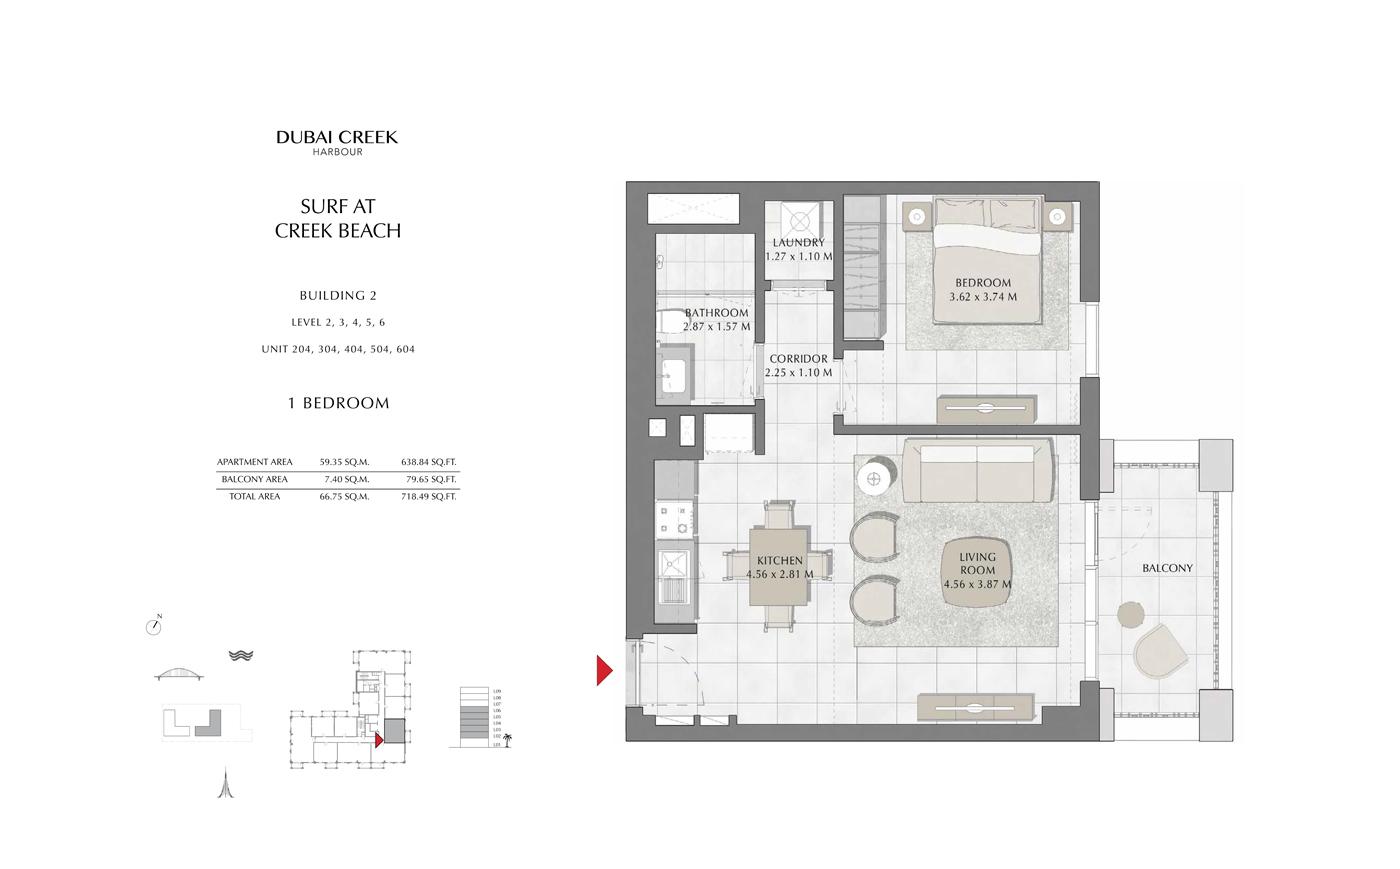 Building 2, 1 Bedroom Level 2, 3, 4, 5, 6, Size 718 Sq Ft